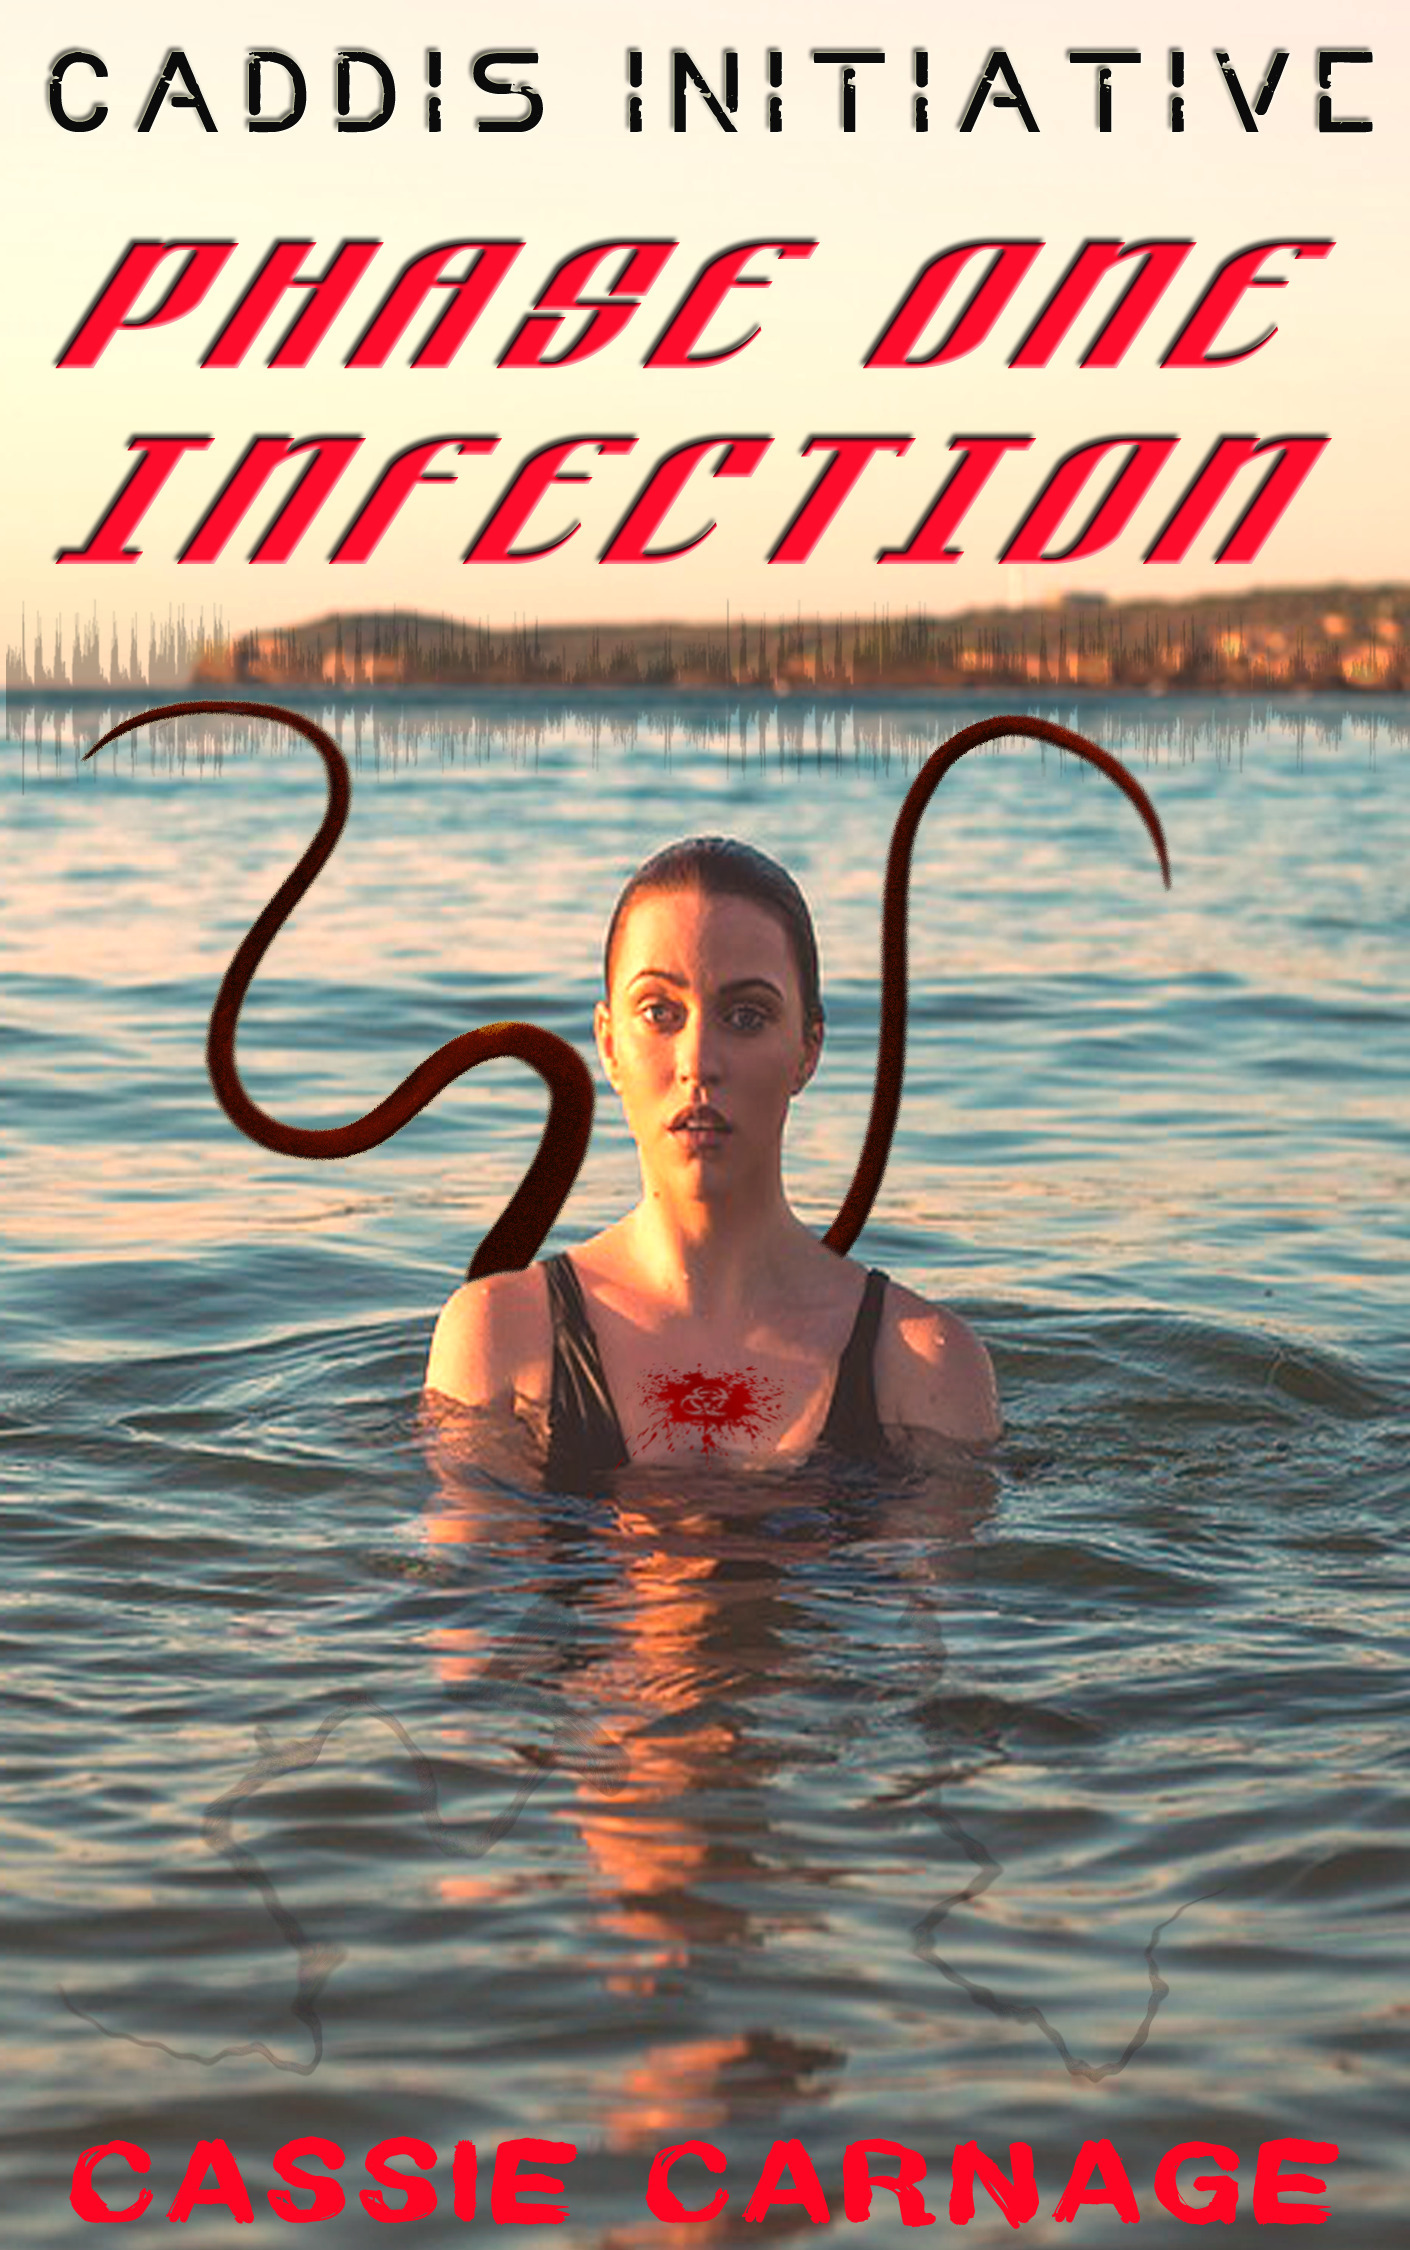 INFECTION: CADDIS INITIATIVE PH - cassiecarnage | ello